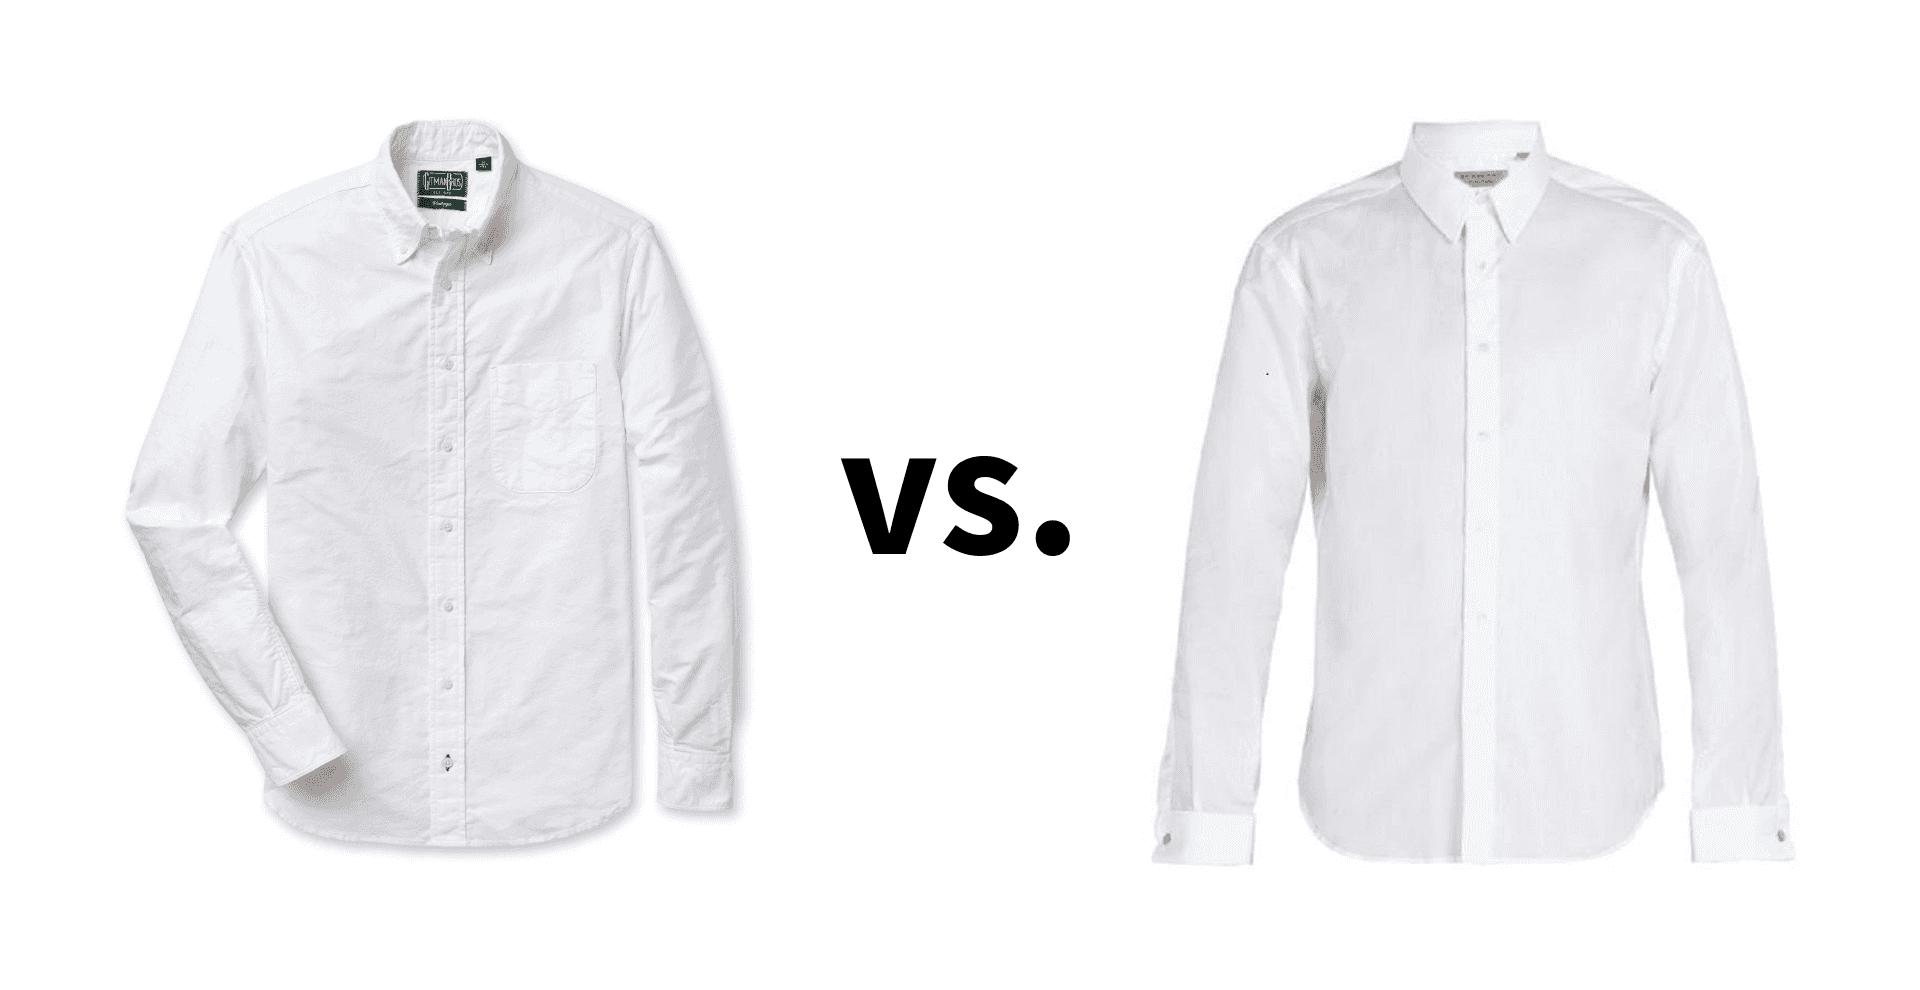 OCBD vs dress shirt